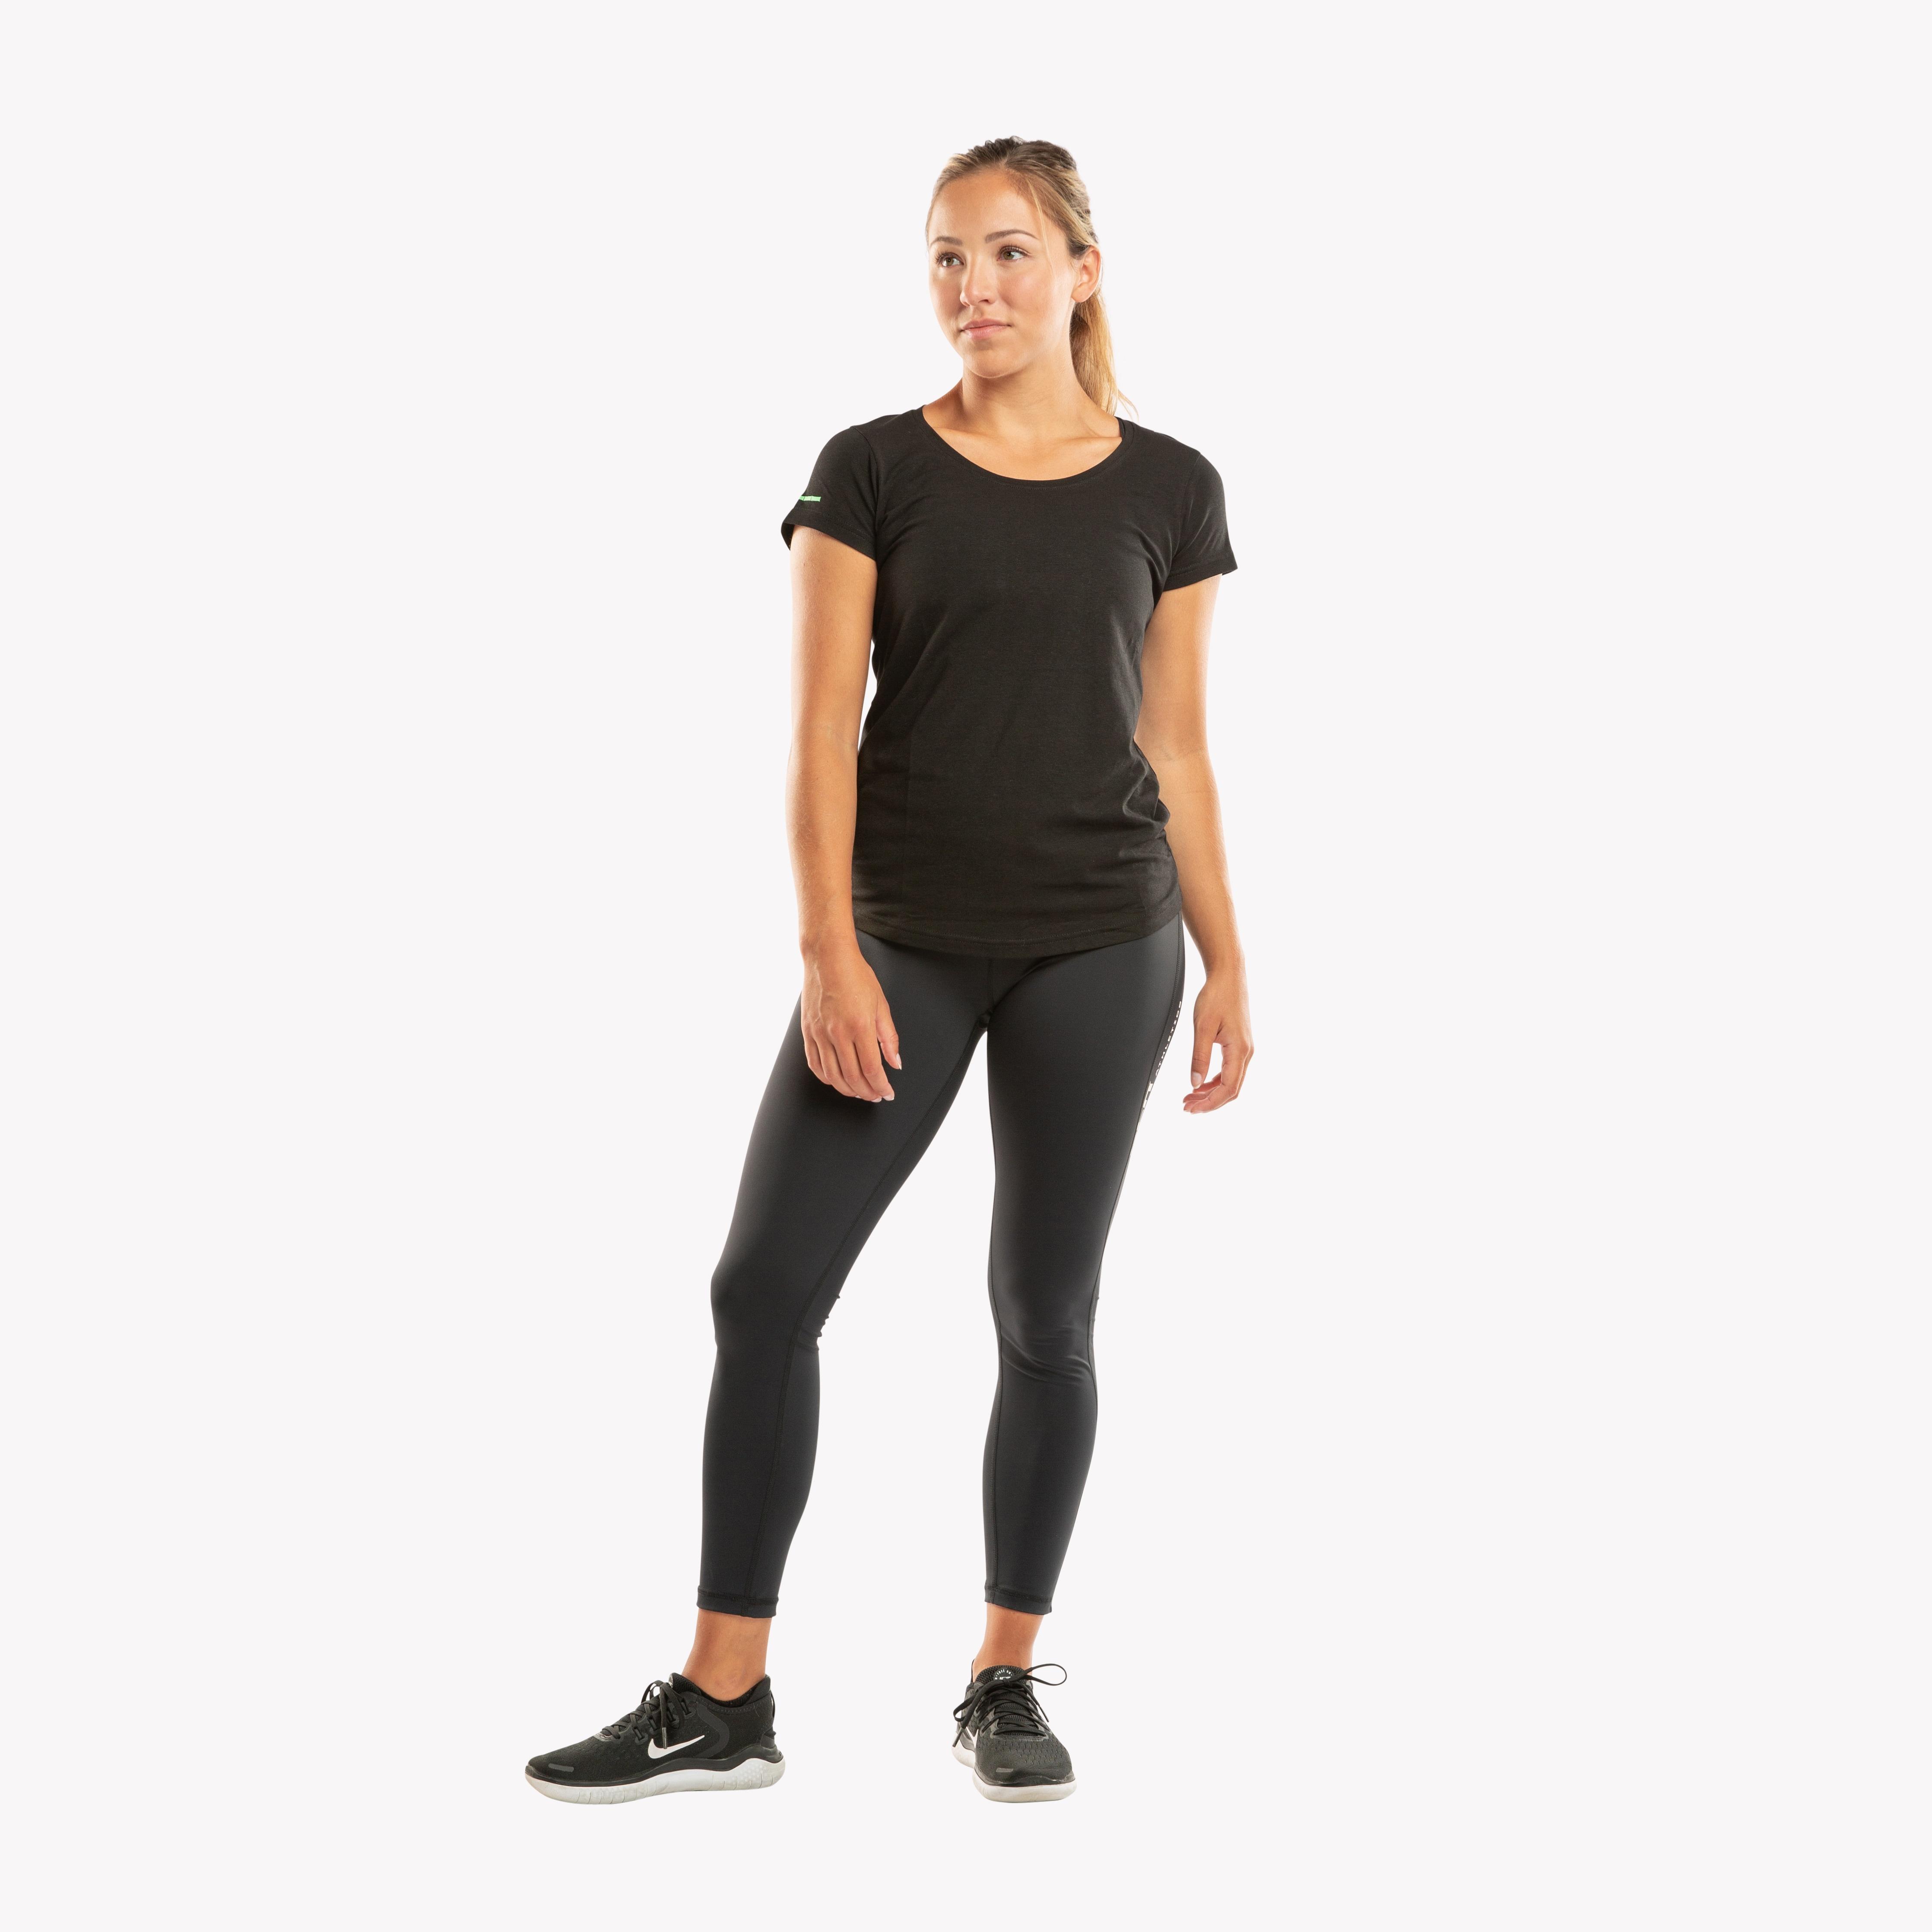 CLN Bamboo ws T-shirt Black